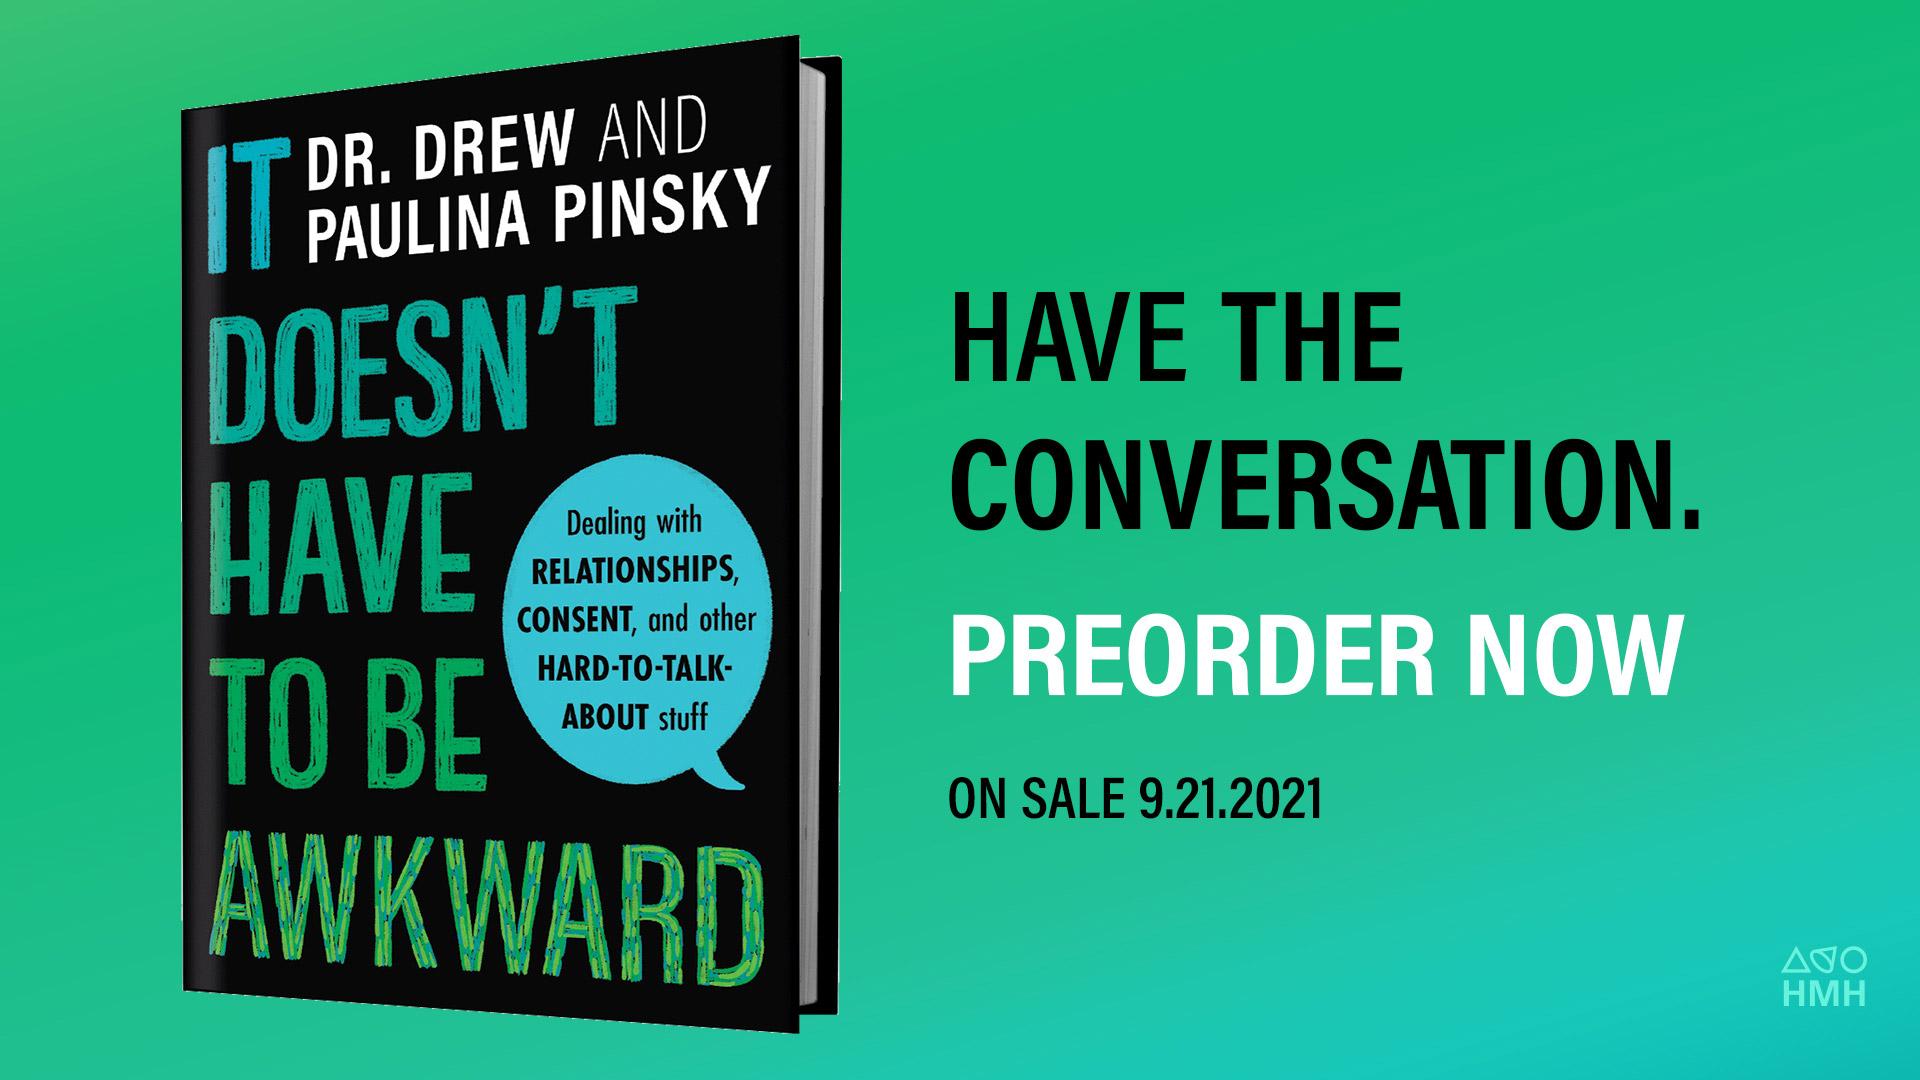 Join Dr. Drew & Paulina Pinsky on TalkShop LIVE on 9/17!